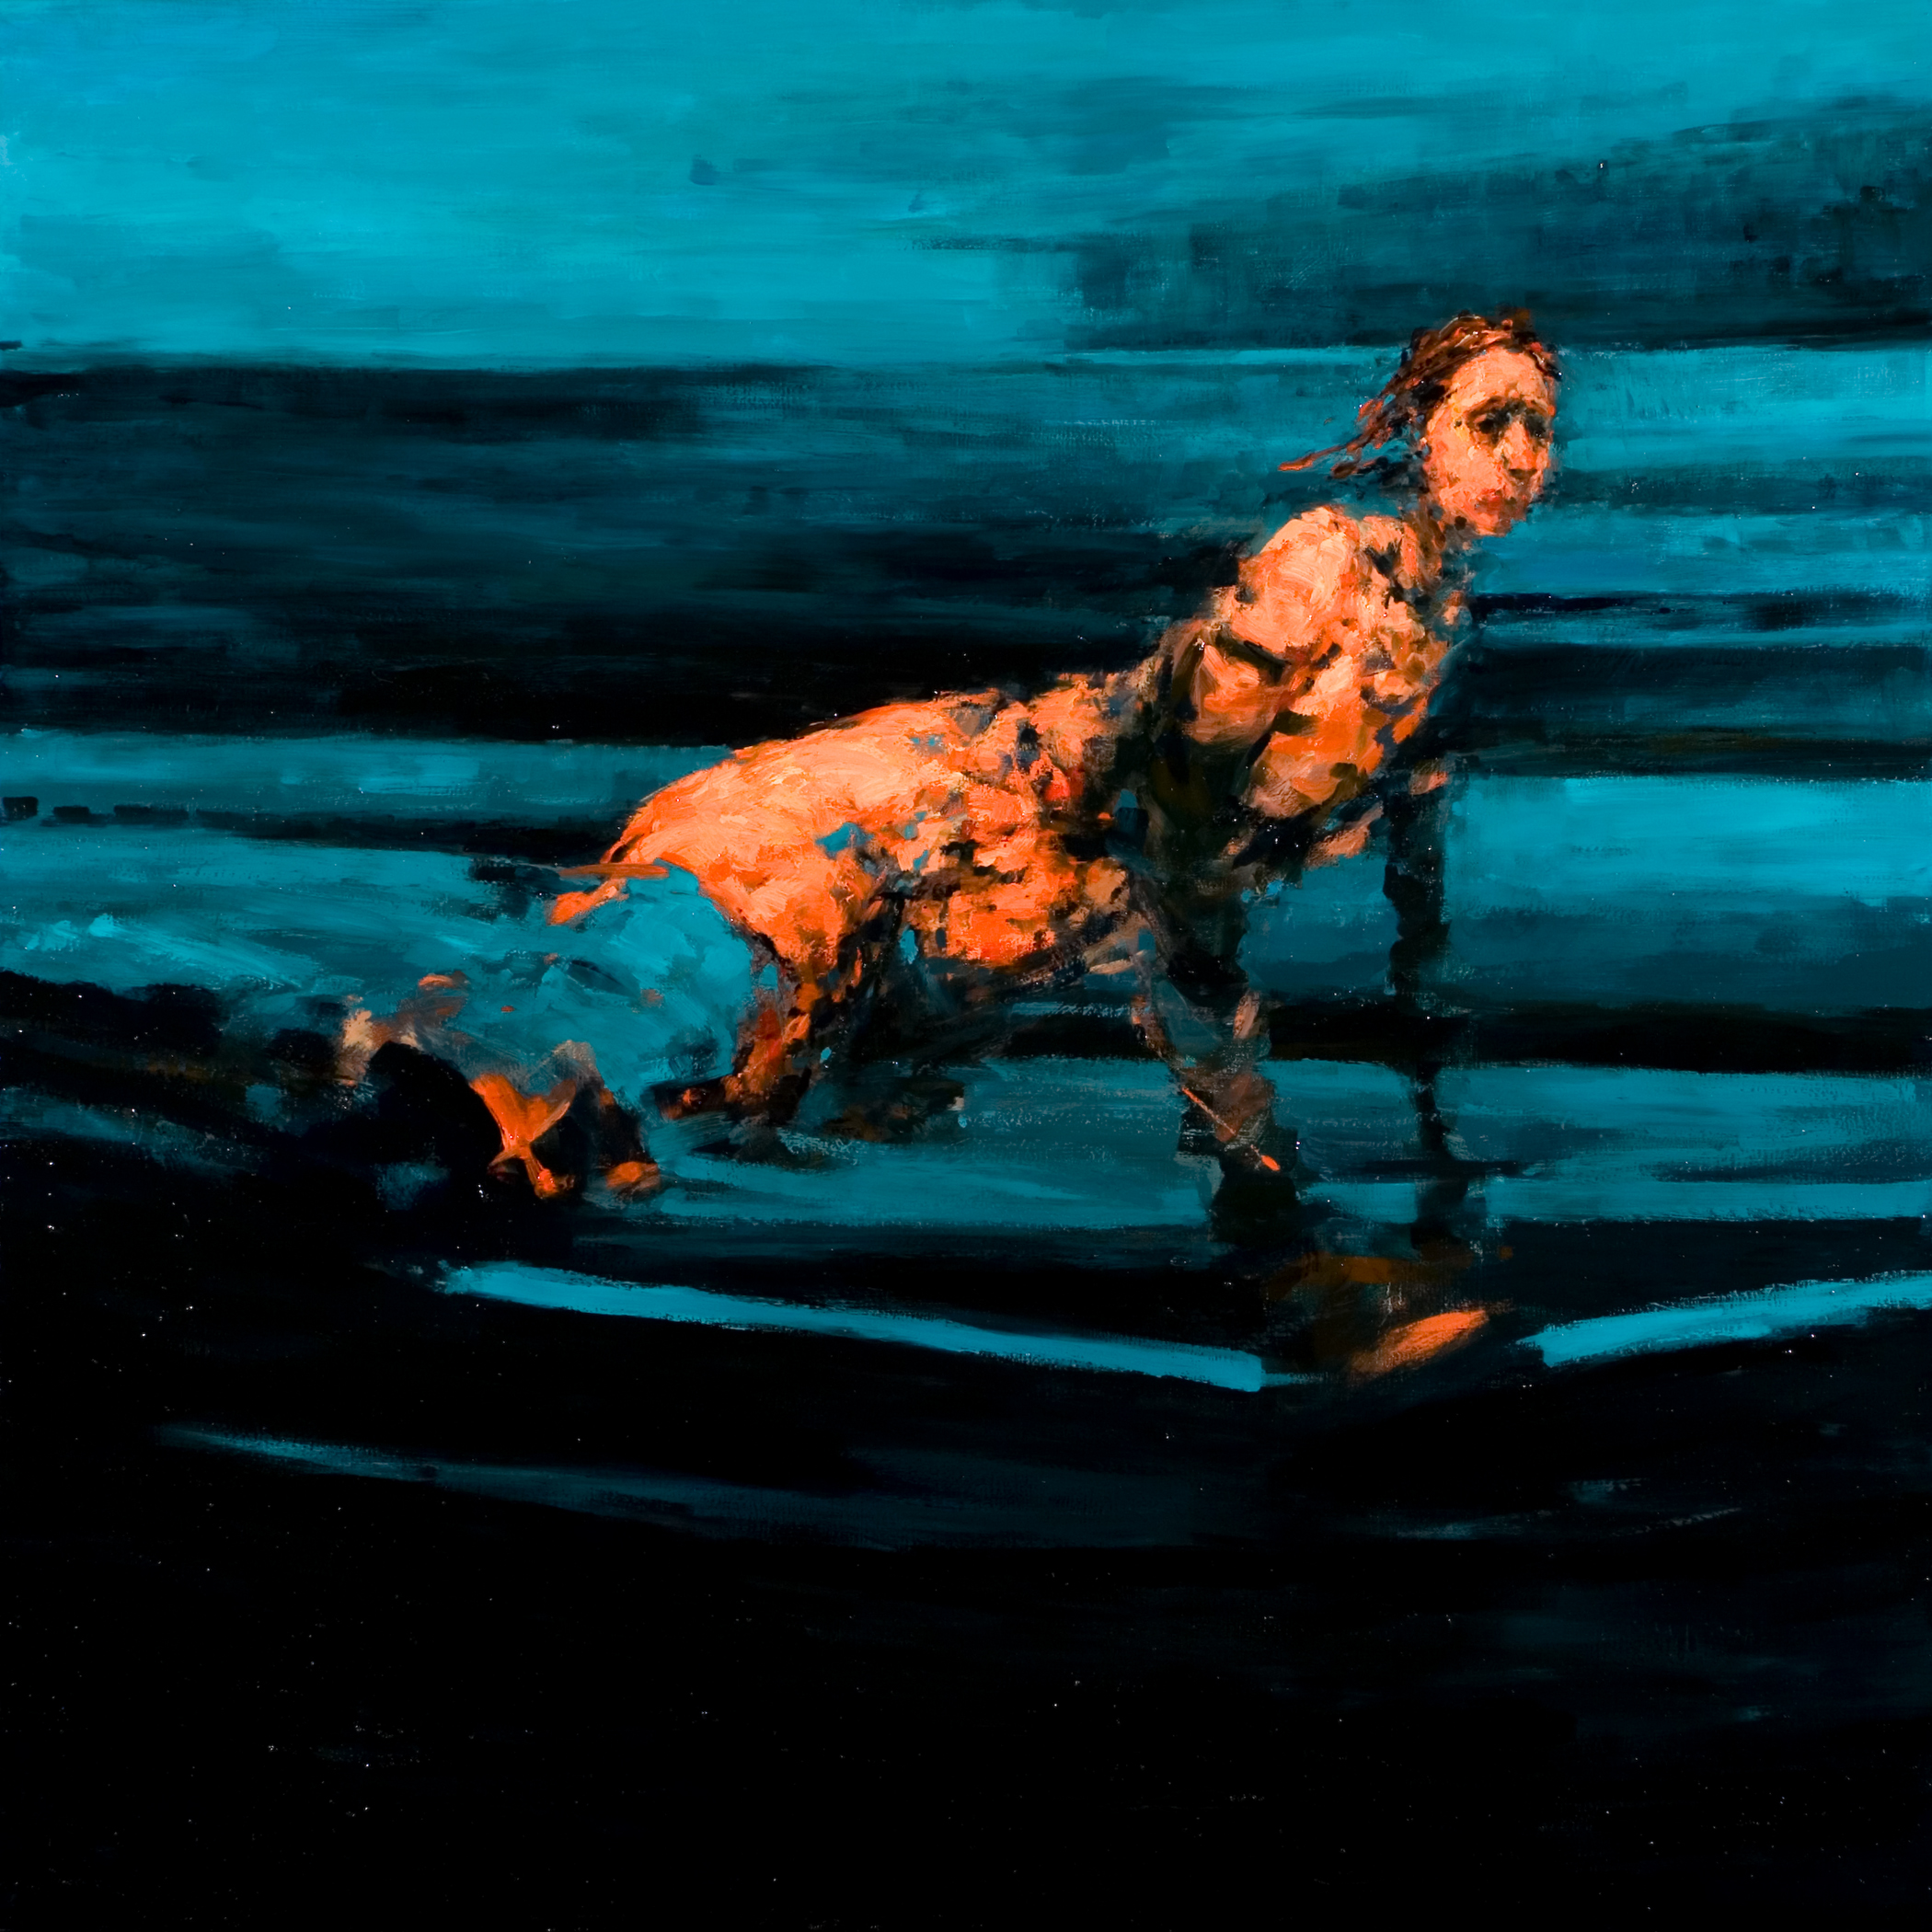 "Crux, oil on canvas, 42"" x 42"" x 2"", 2012"